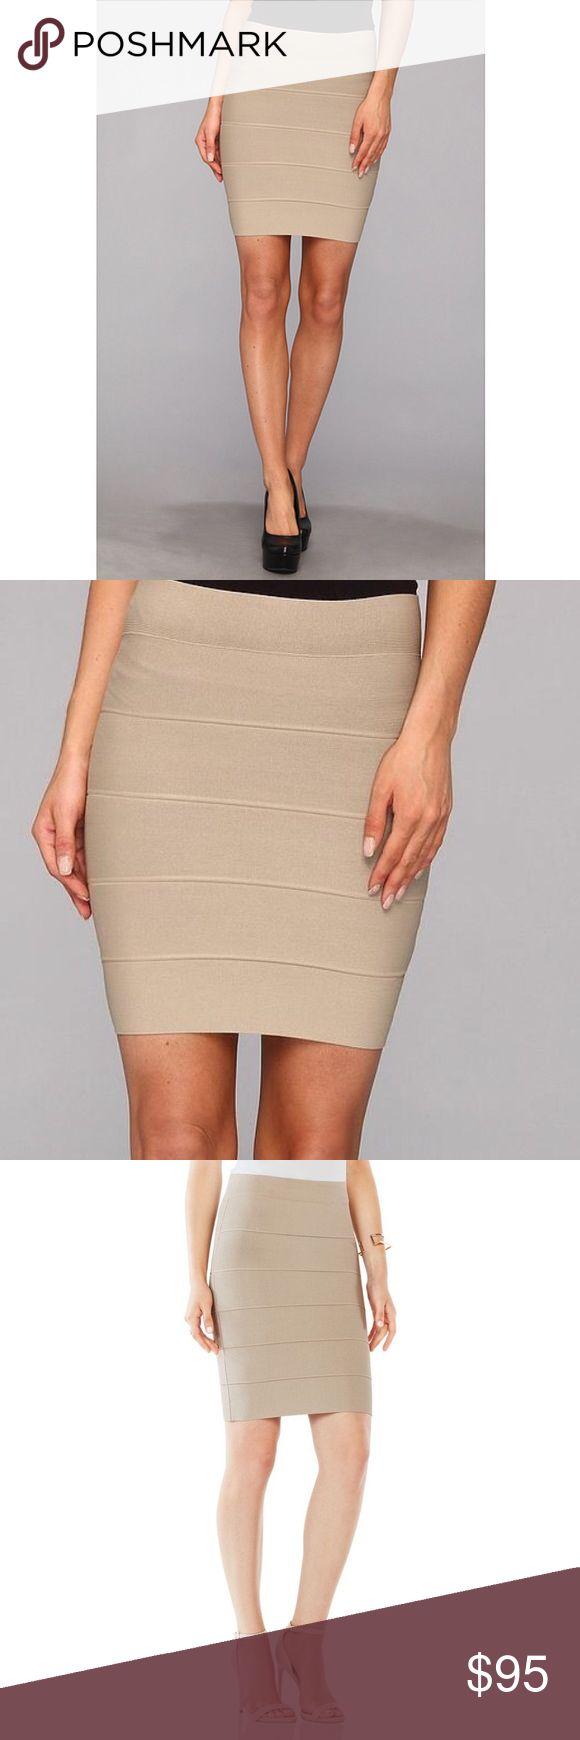 "BCBGMaxAzria Khaki Knit Body Con Skirt Brand new, never worn, size XS, approximate measurements laying flat: L/16"" x W/11"" . Pull up, Khaki bandage / body con skirt, a little stretch. Made of rayon, rayon, nylon and spandex. BCBGMaxAzria Skirts Mini"